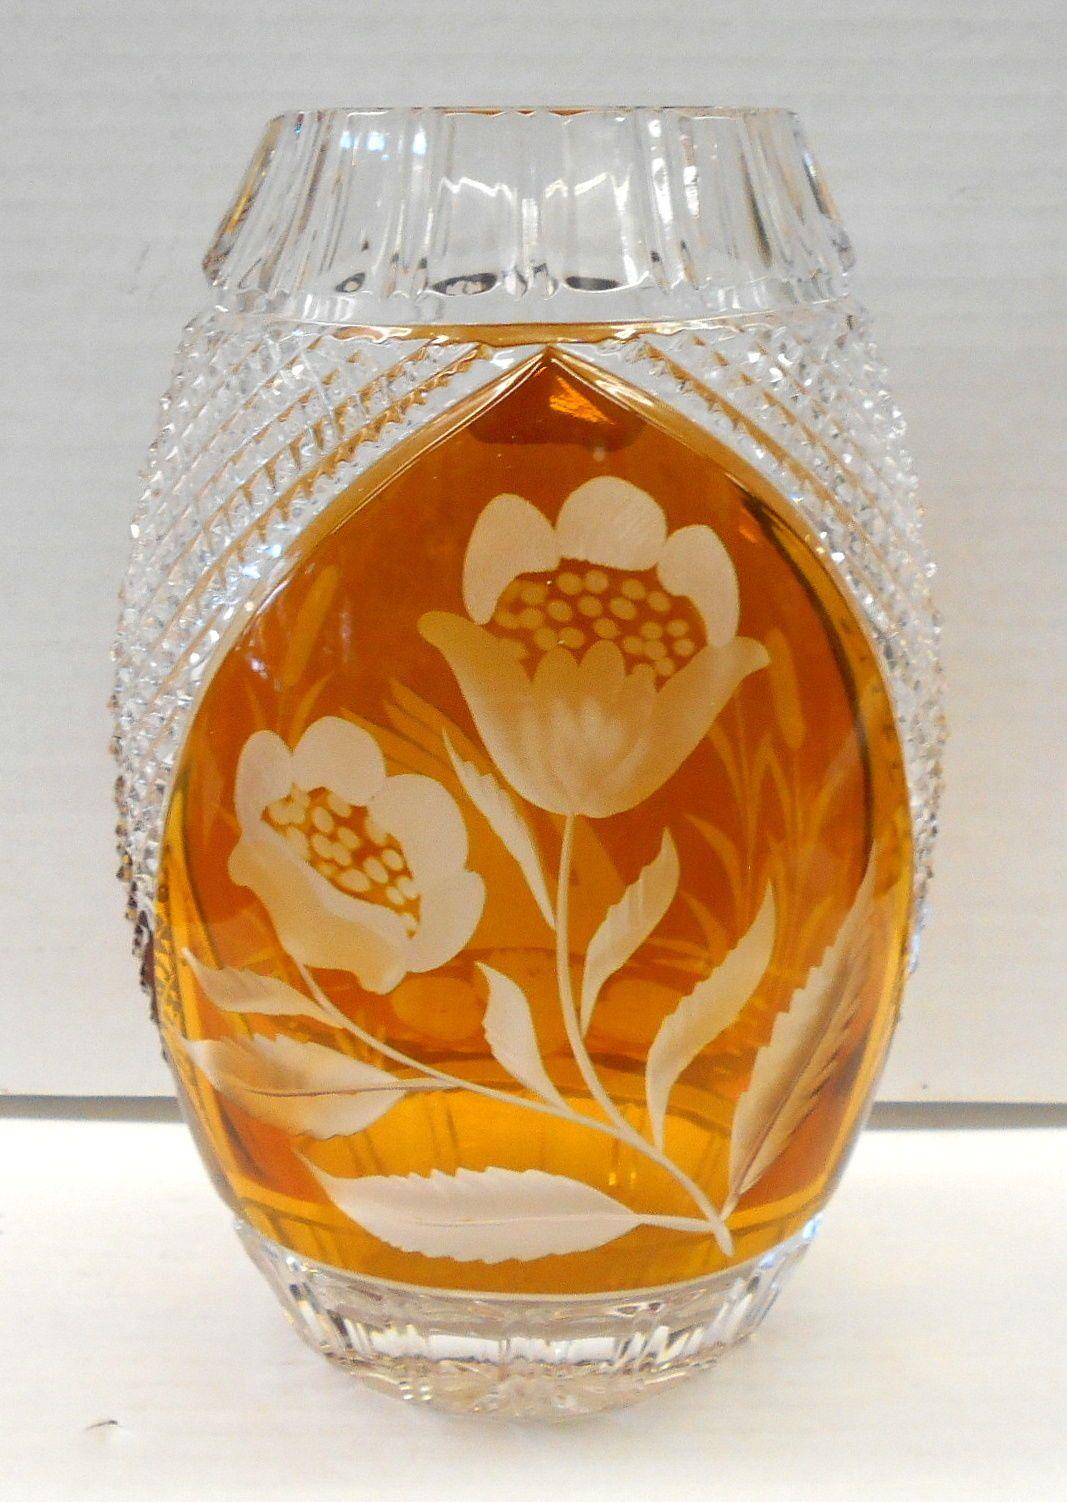 Vintage julia wheel cut lead crystal vase swan and floral made in vintage julia wheel cut lead crystal vase swan and floral made in poland ebay floridaeventfo Choice Image